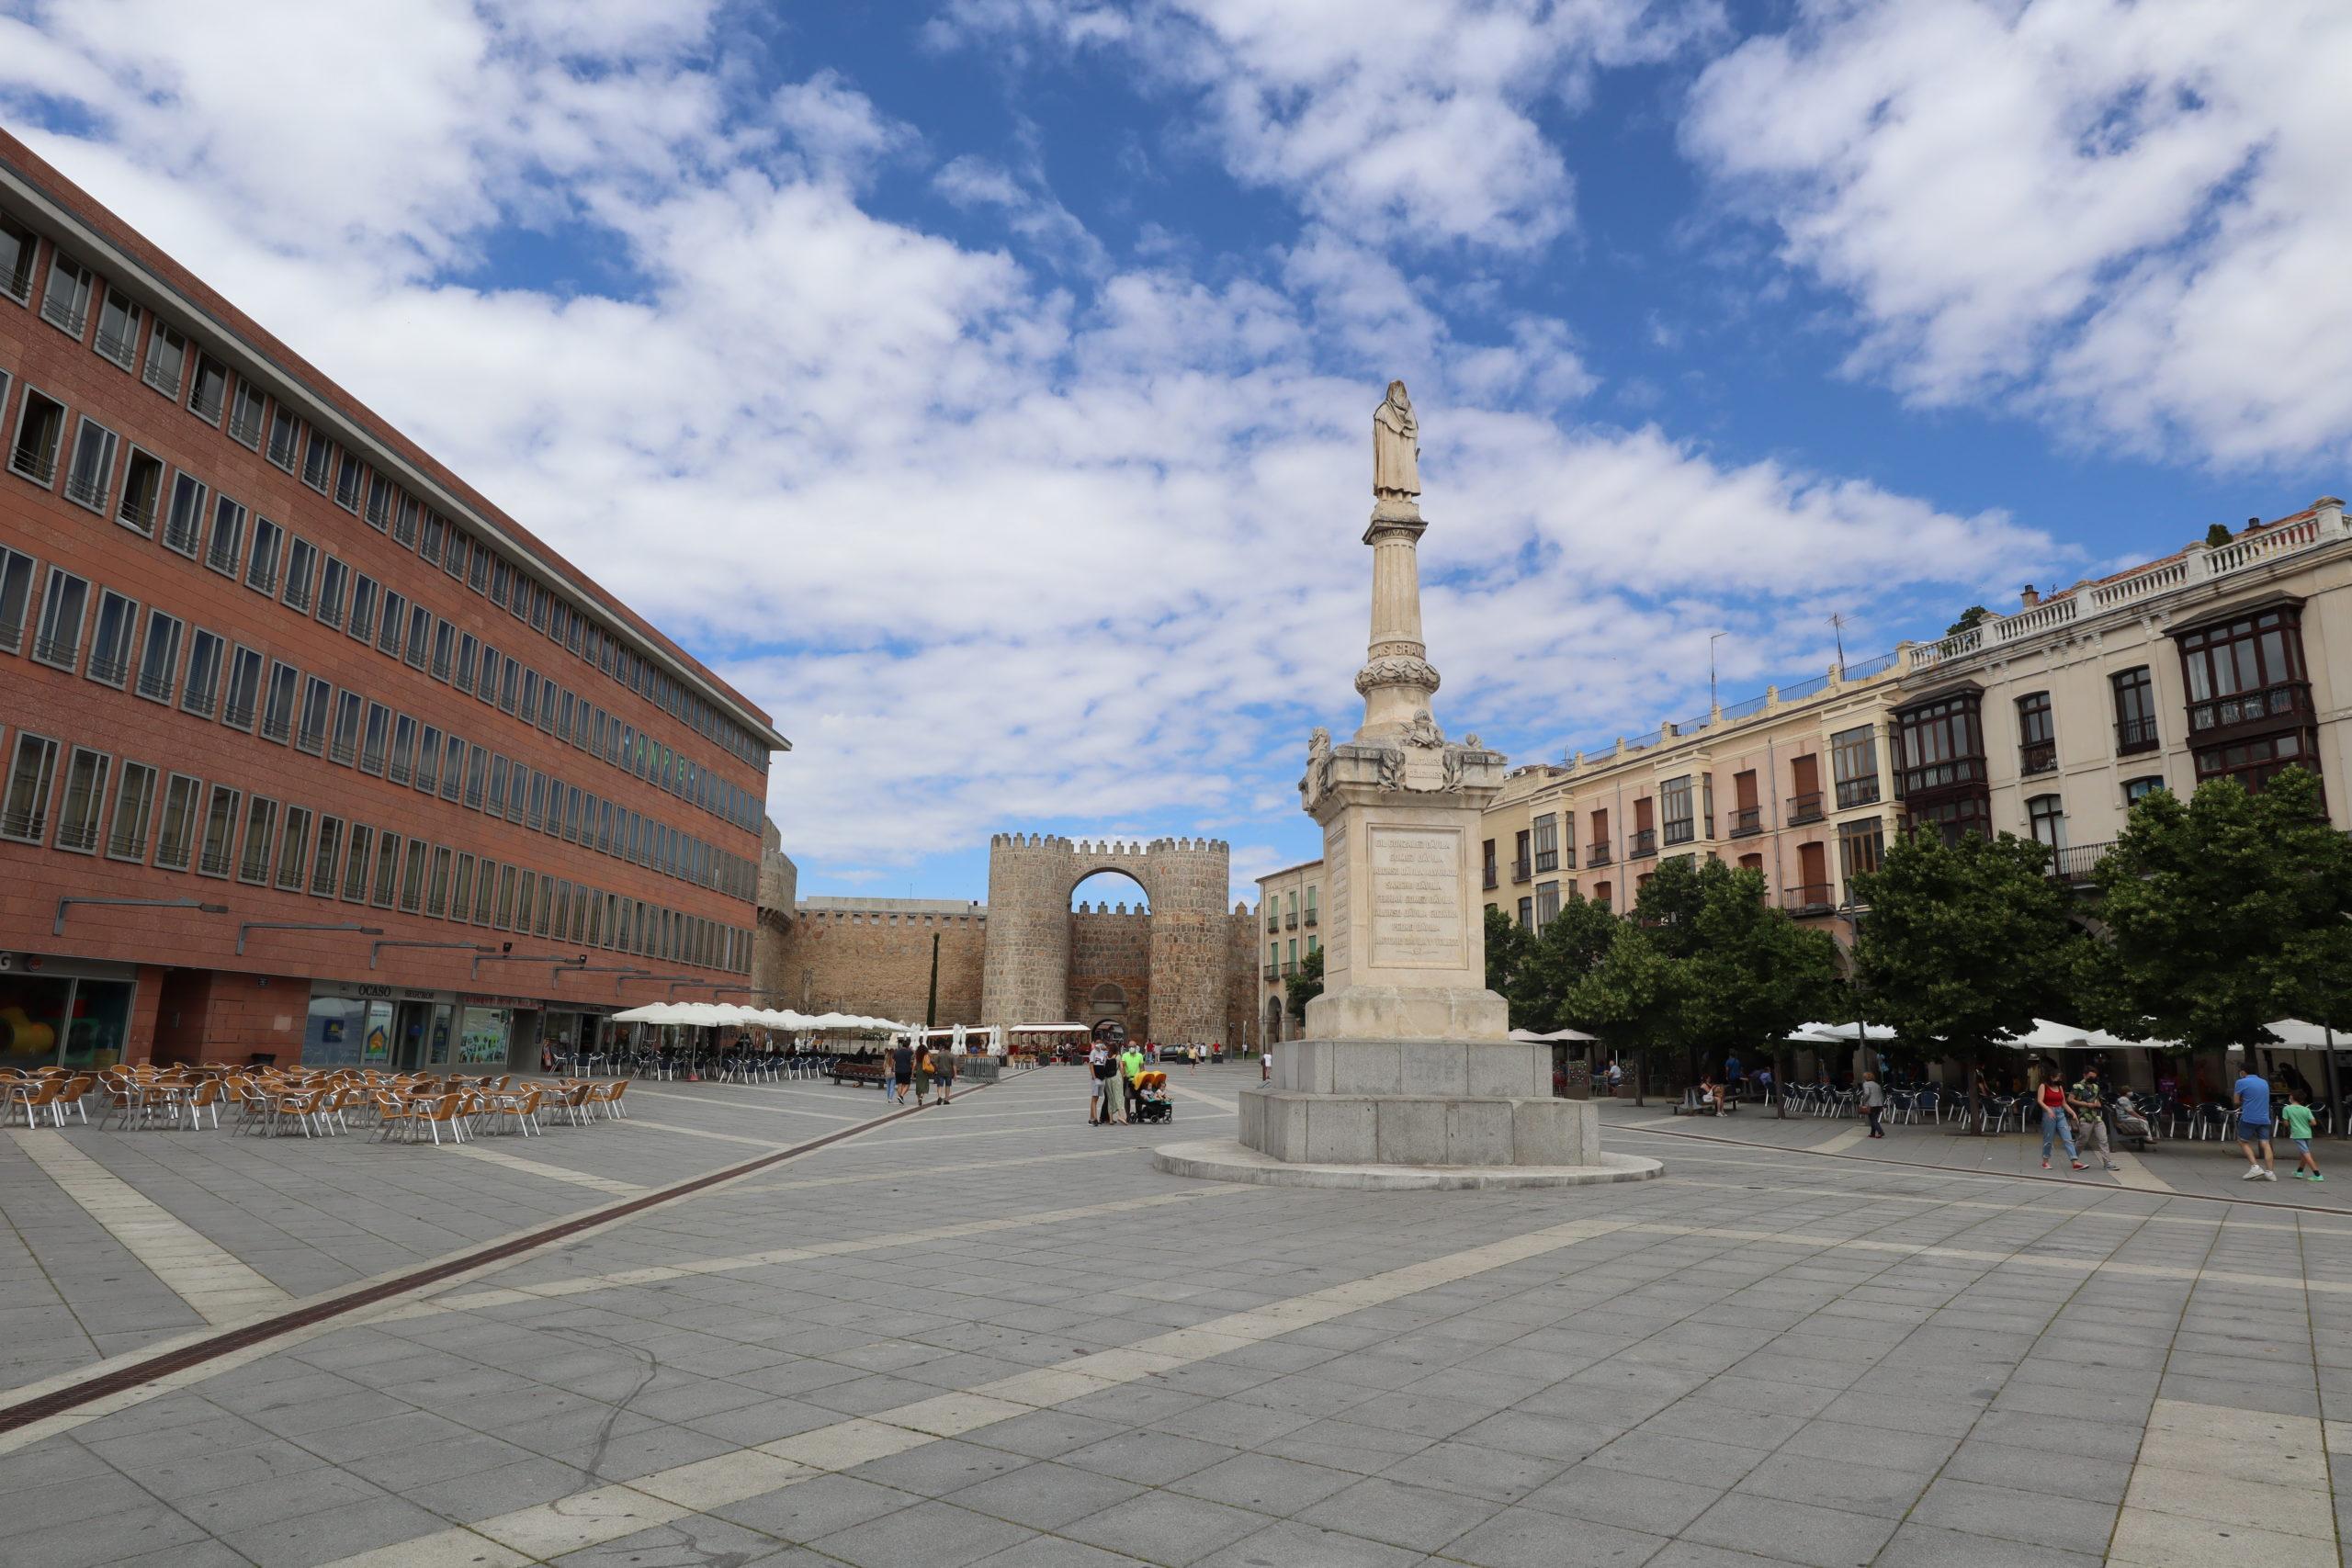 plaza-mercado-de-avila